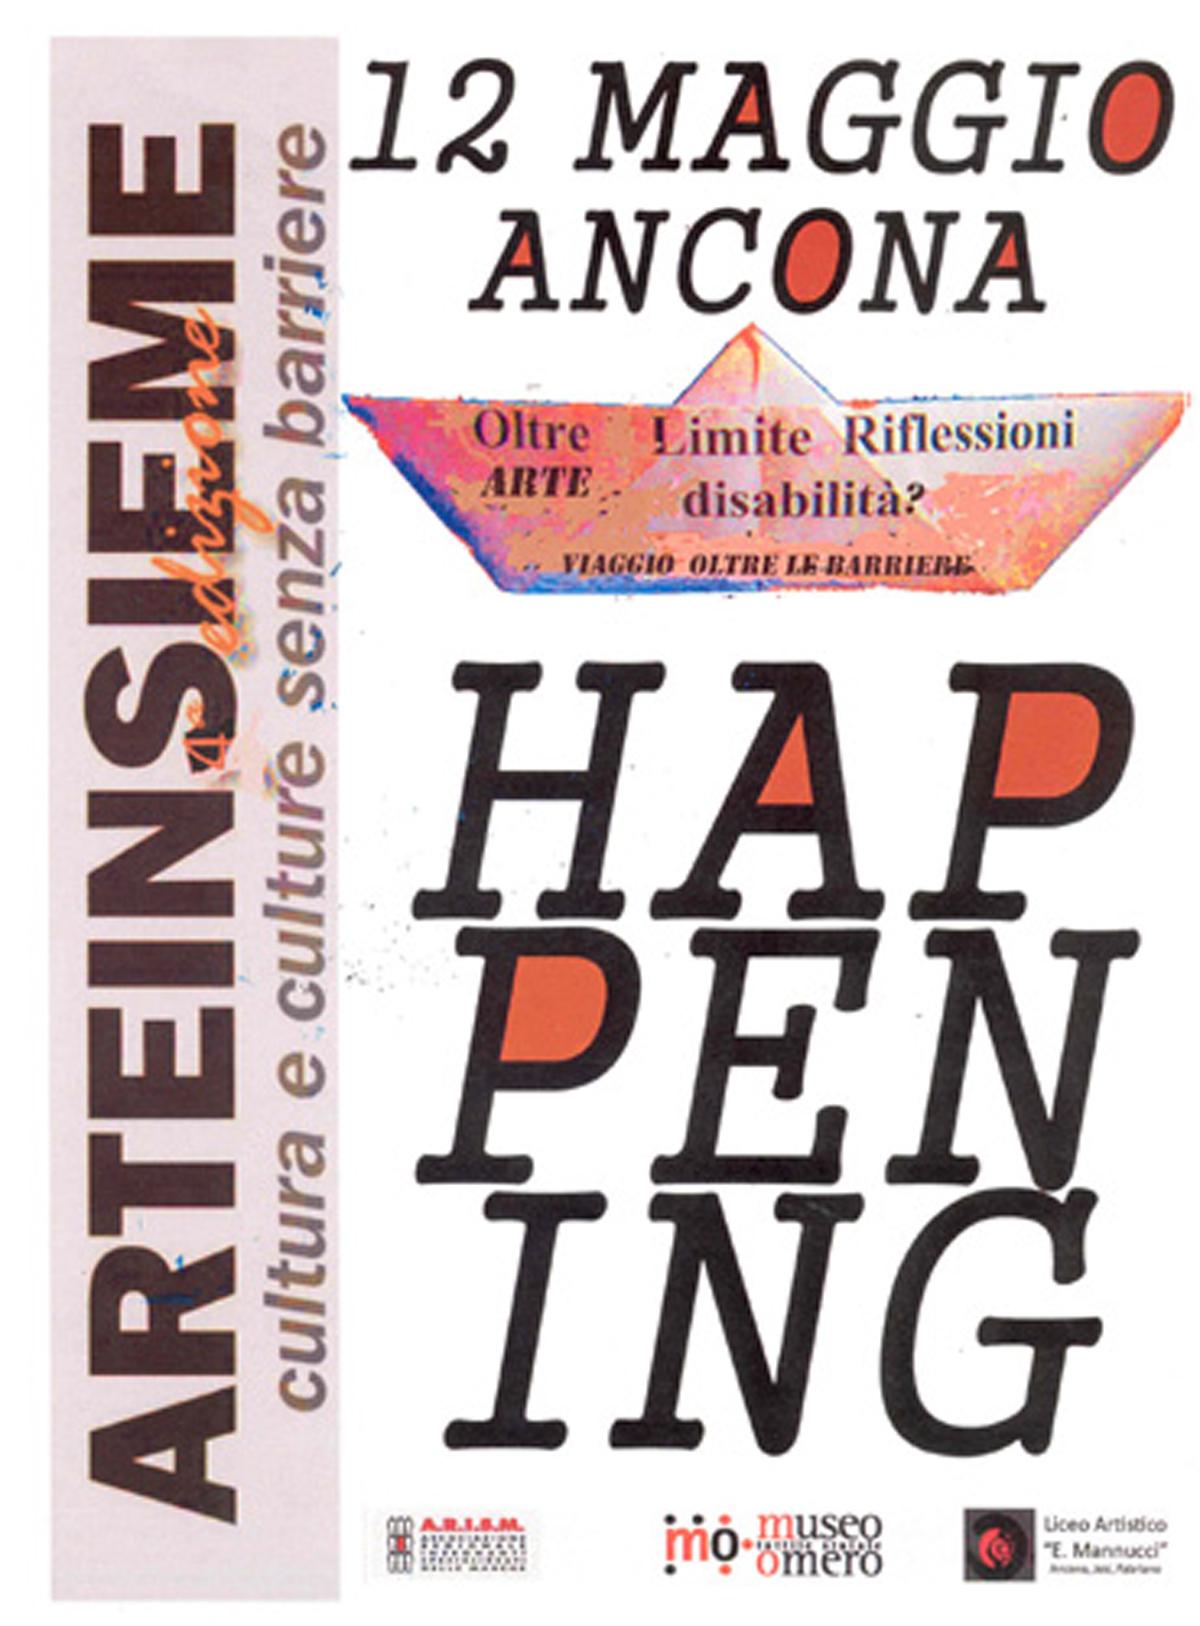 copertina catalogo arteinsime IV edizione